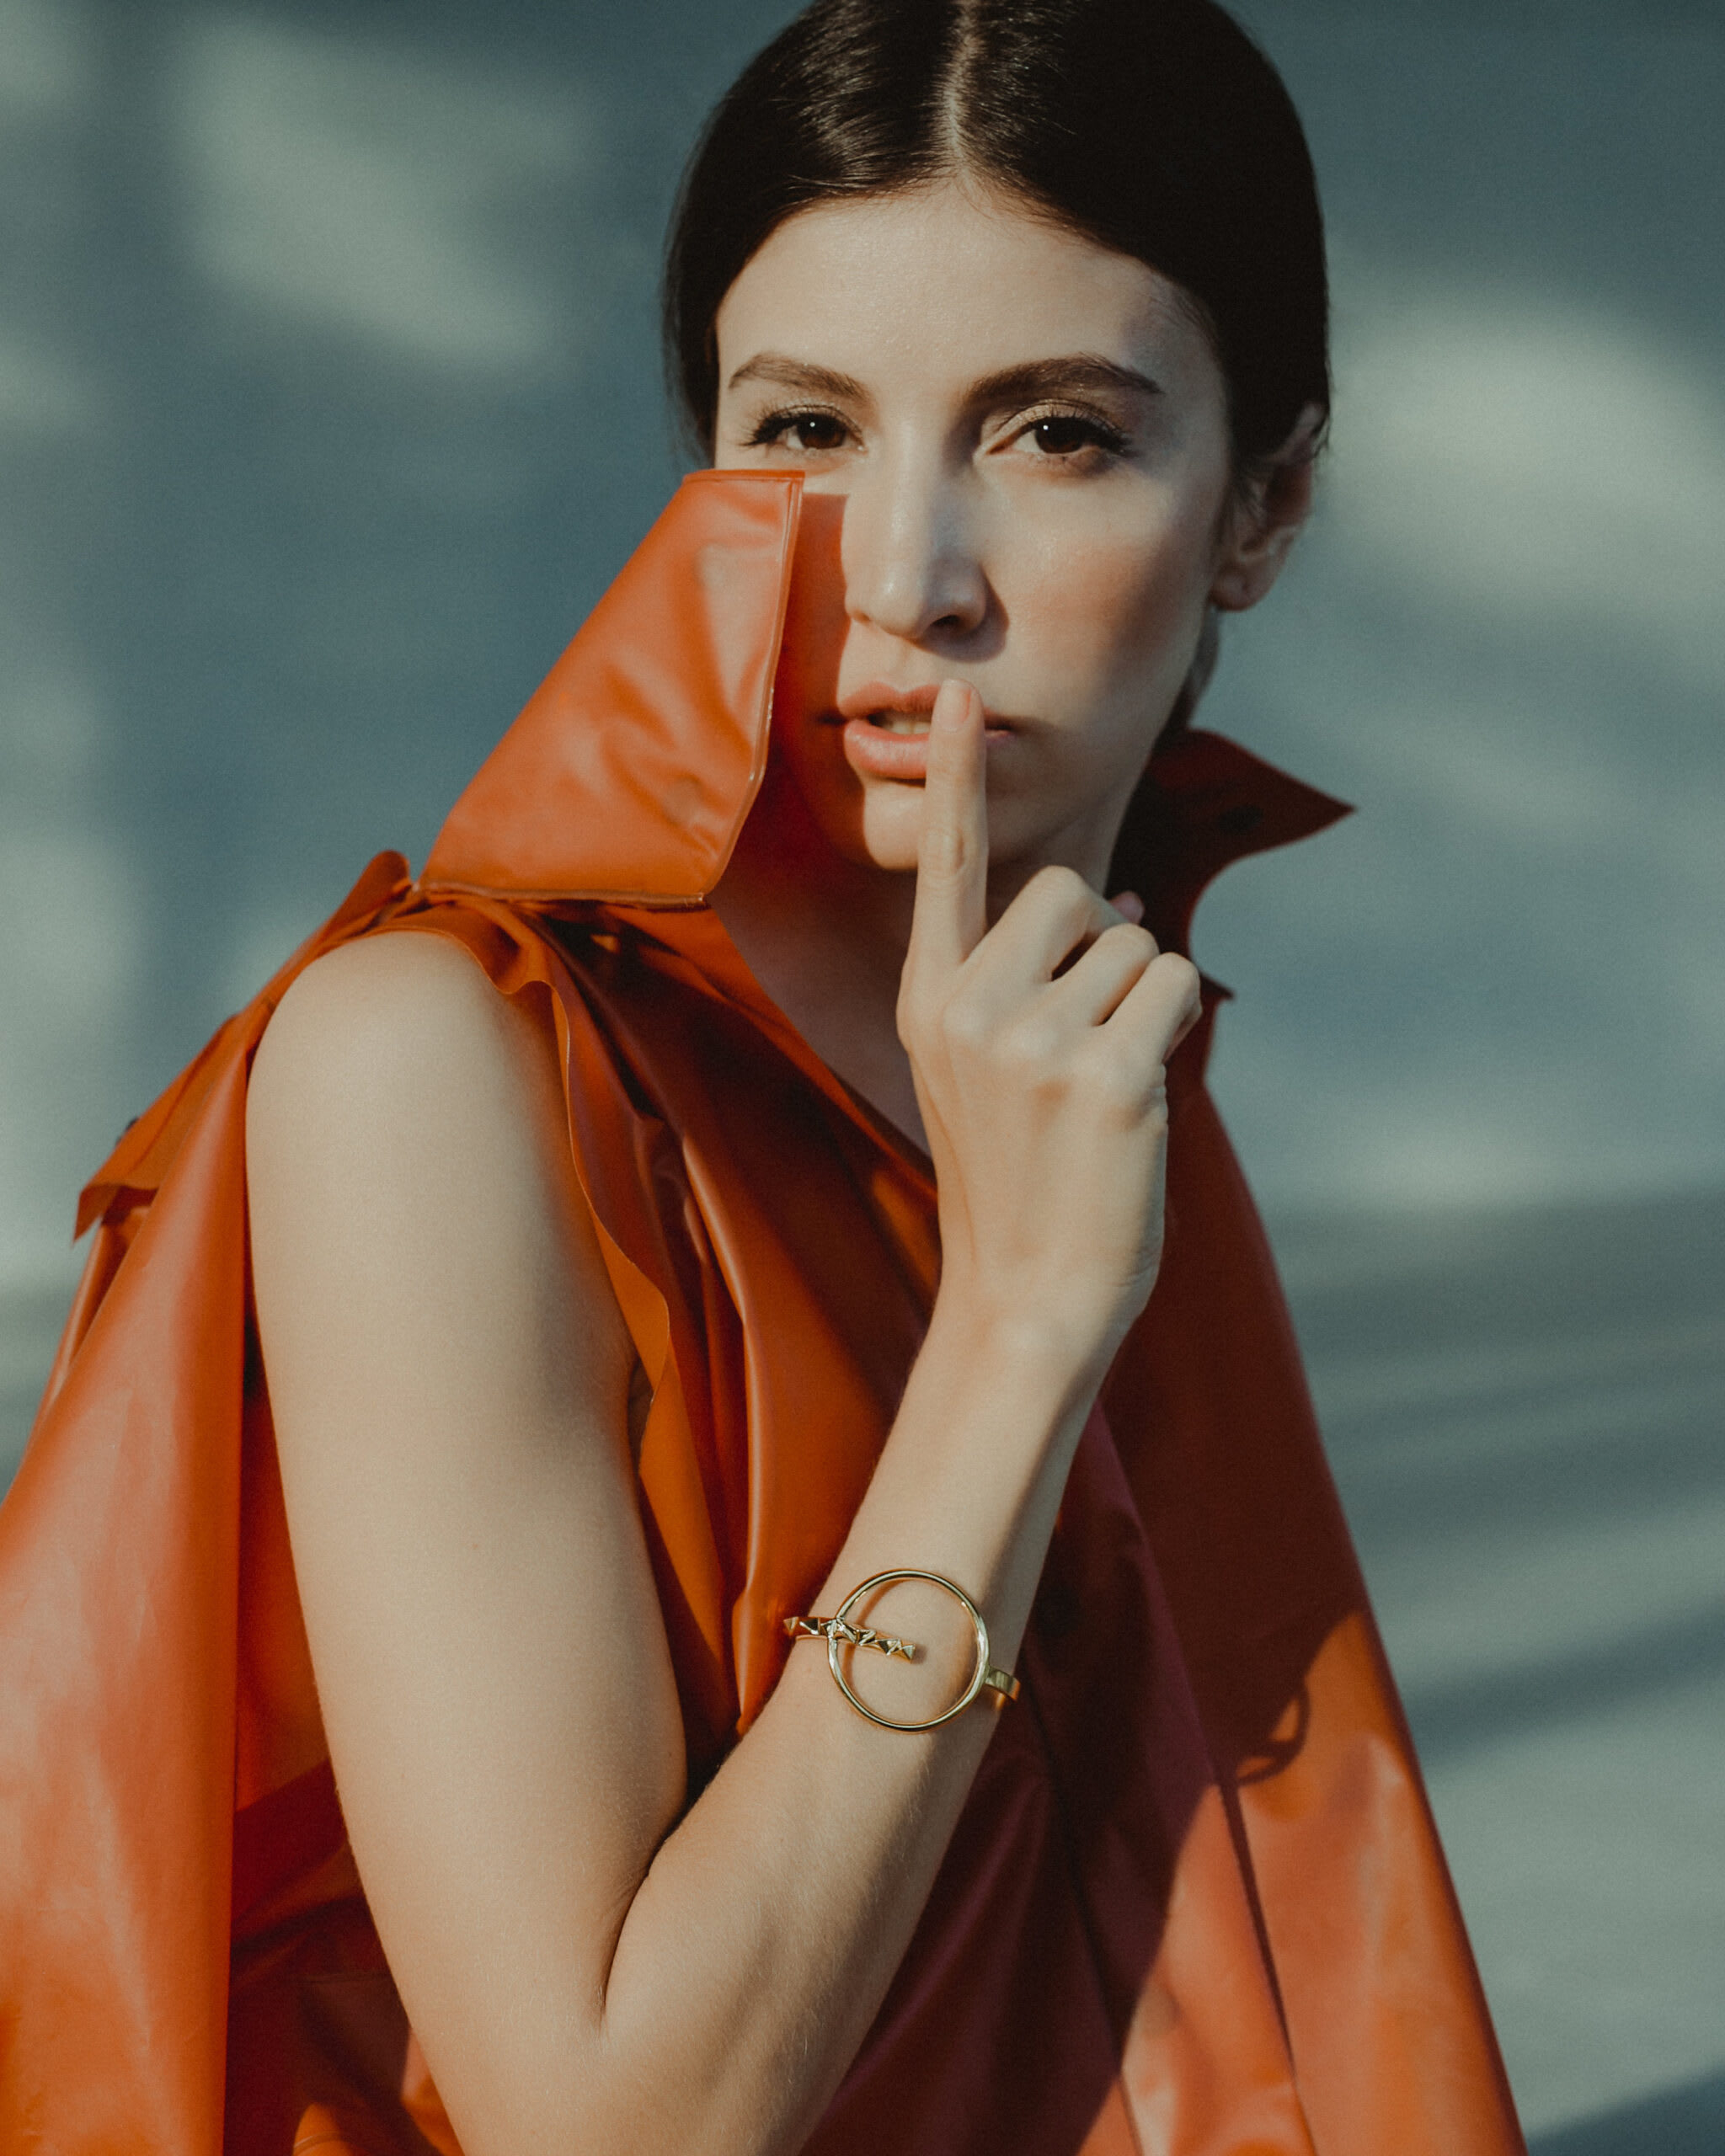 """Orbit Cuff by Soledad Lowe on model"""